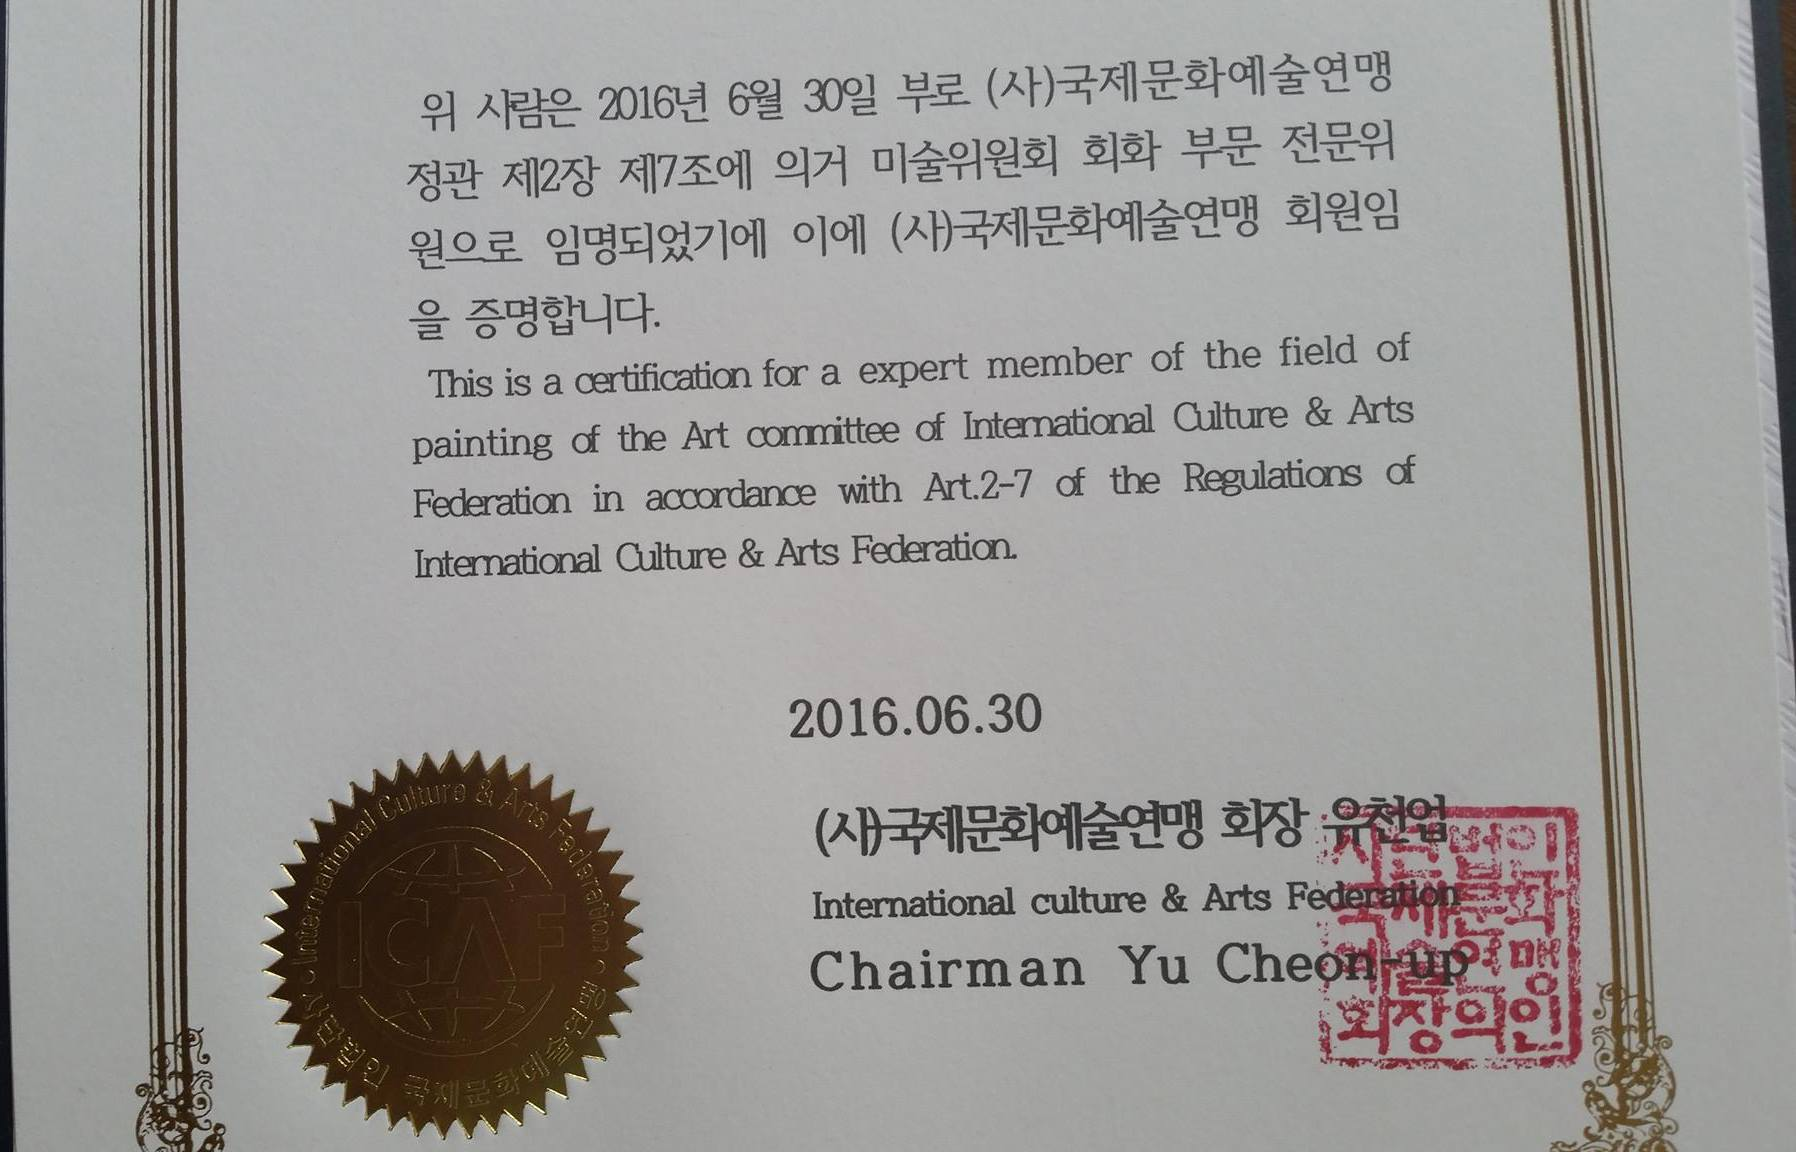 haegeumgang theme museum in south korea8.jpg